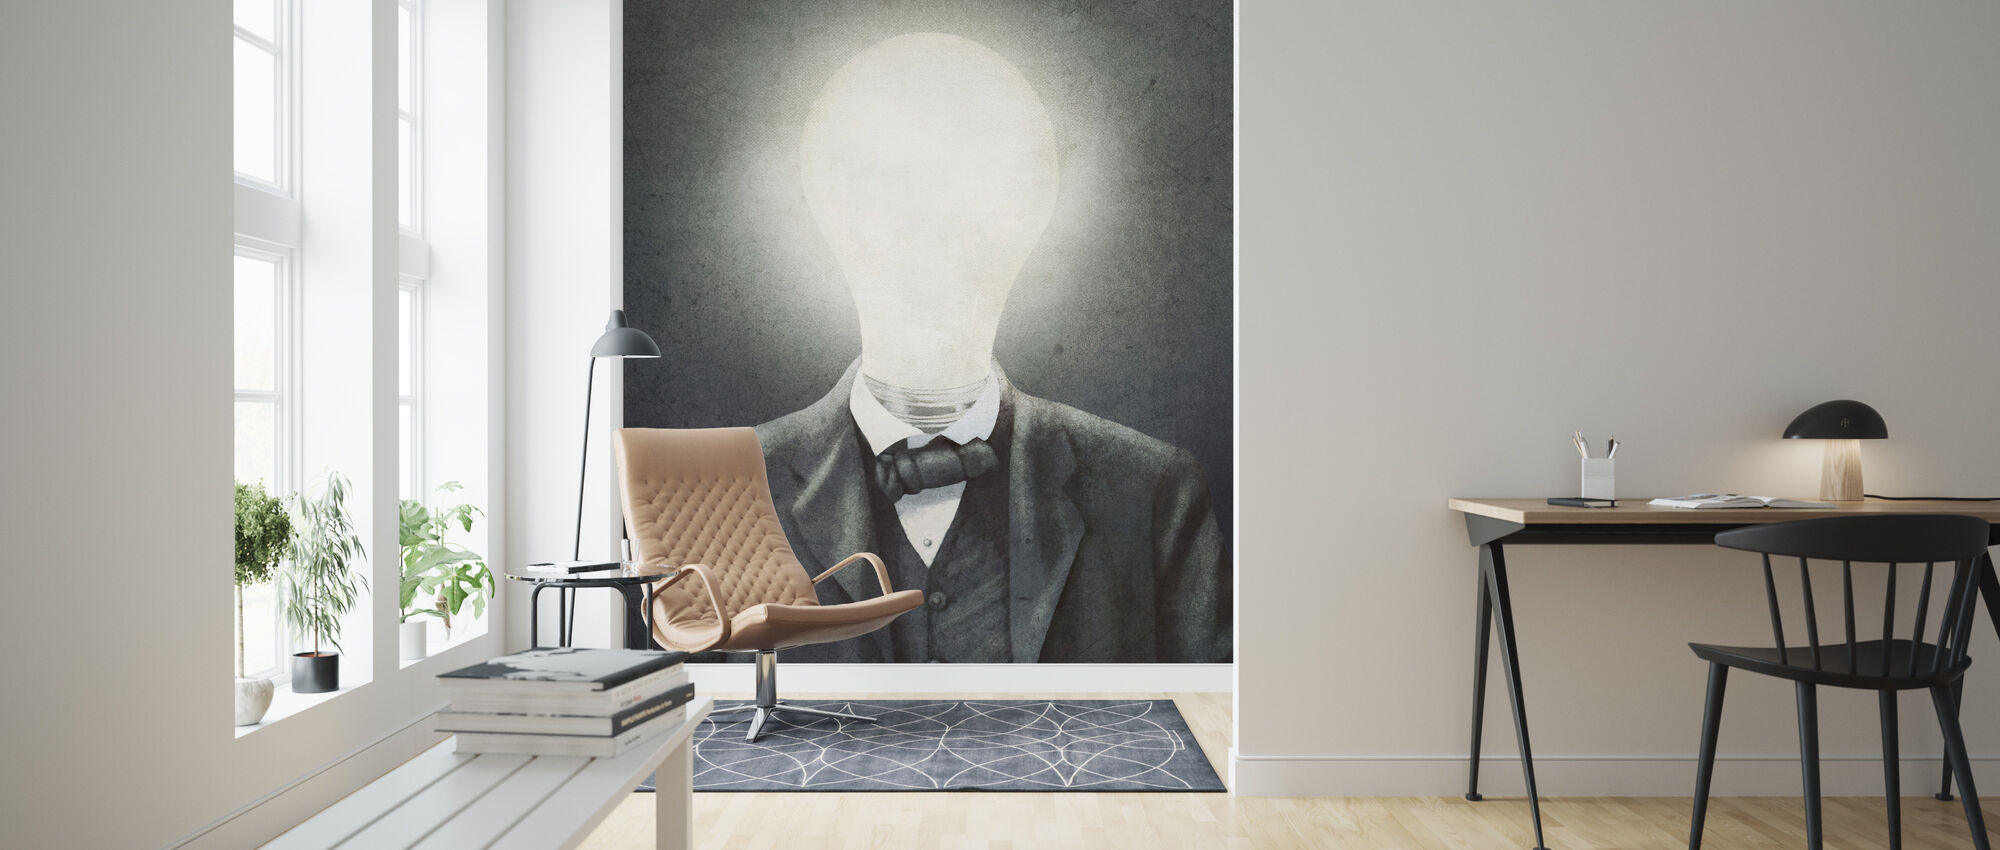 Idé Man - Tapet - Vardagsrum